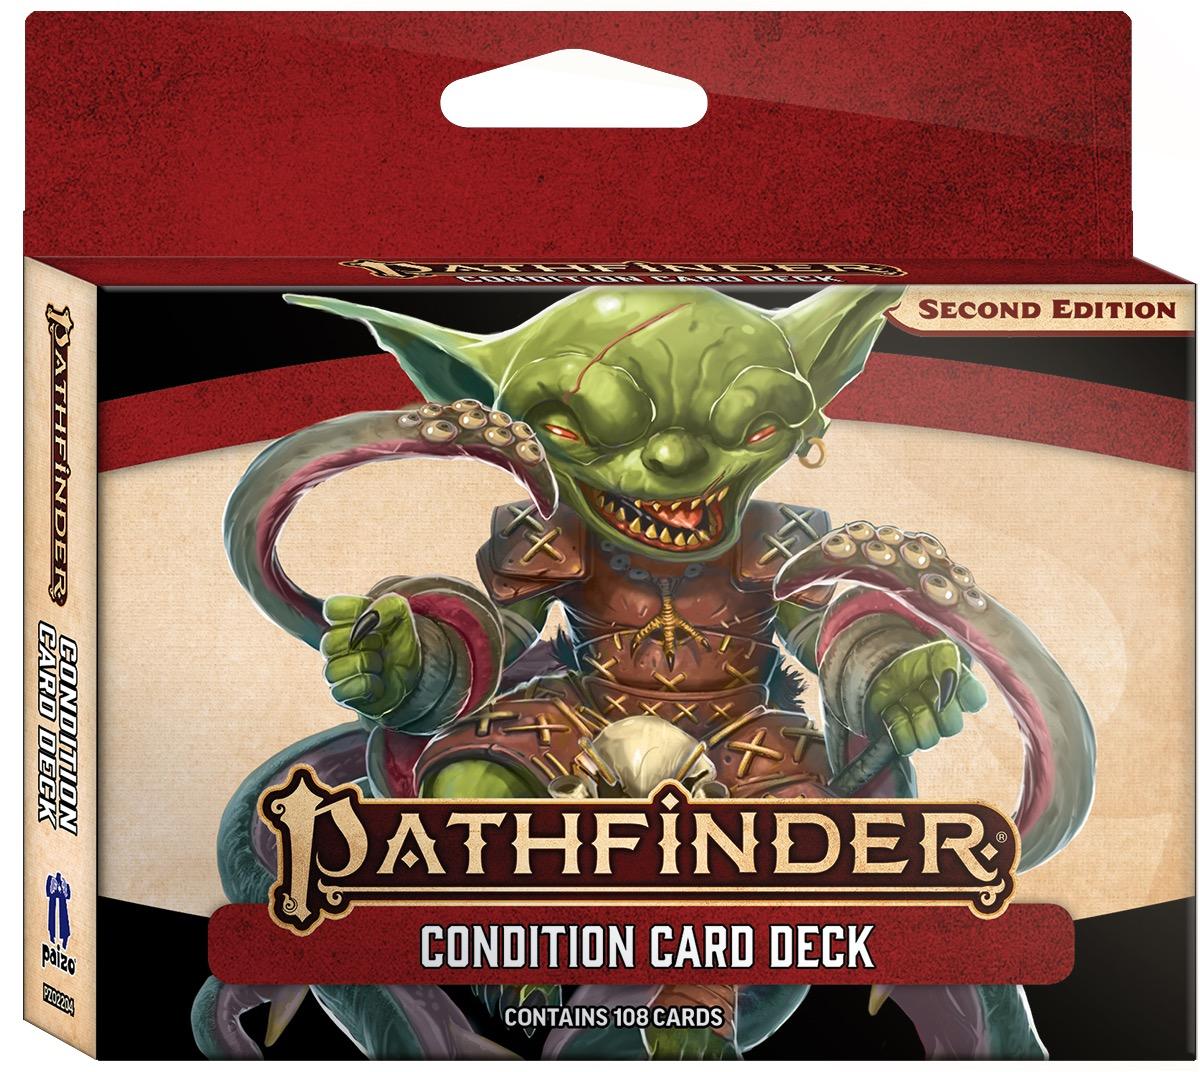 Pathfinder 2E - Condition Card Deck